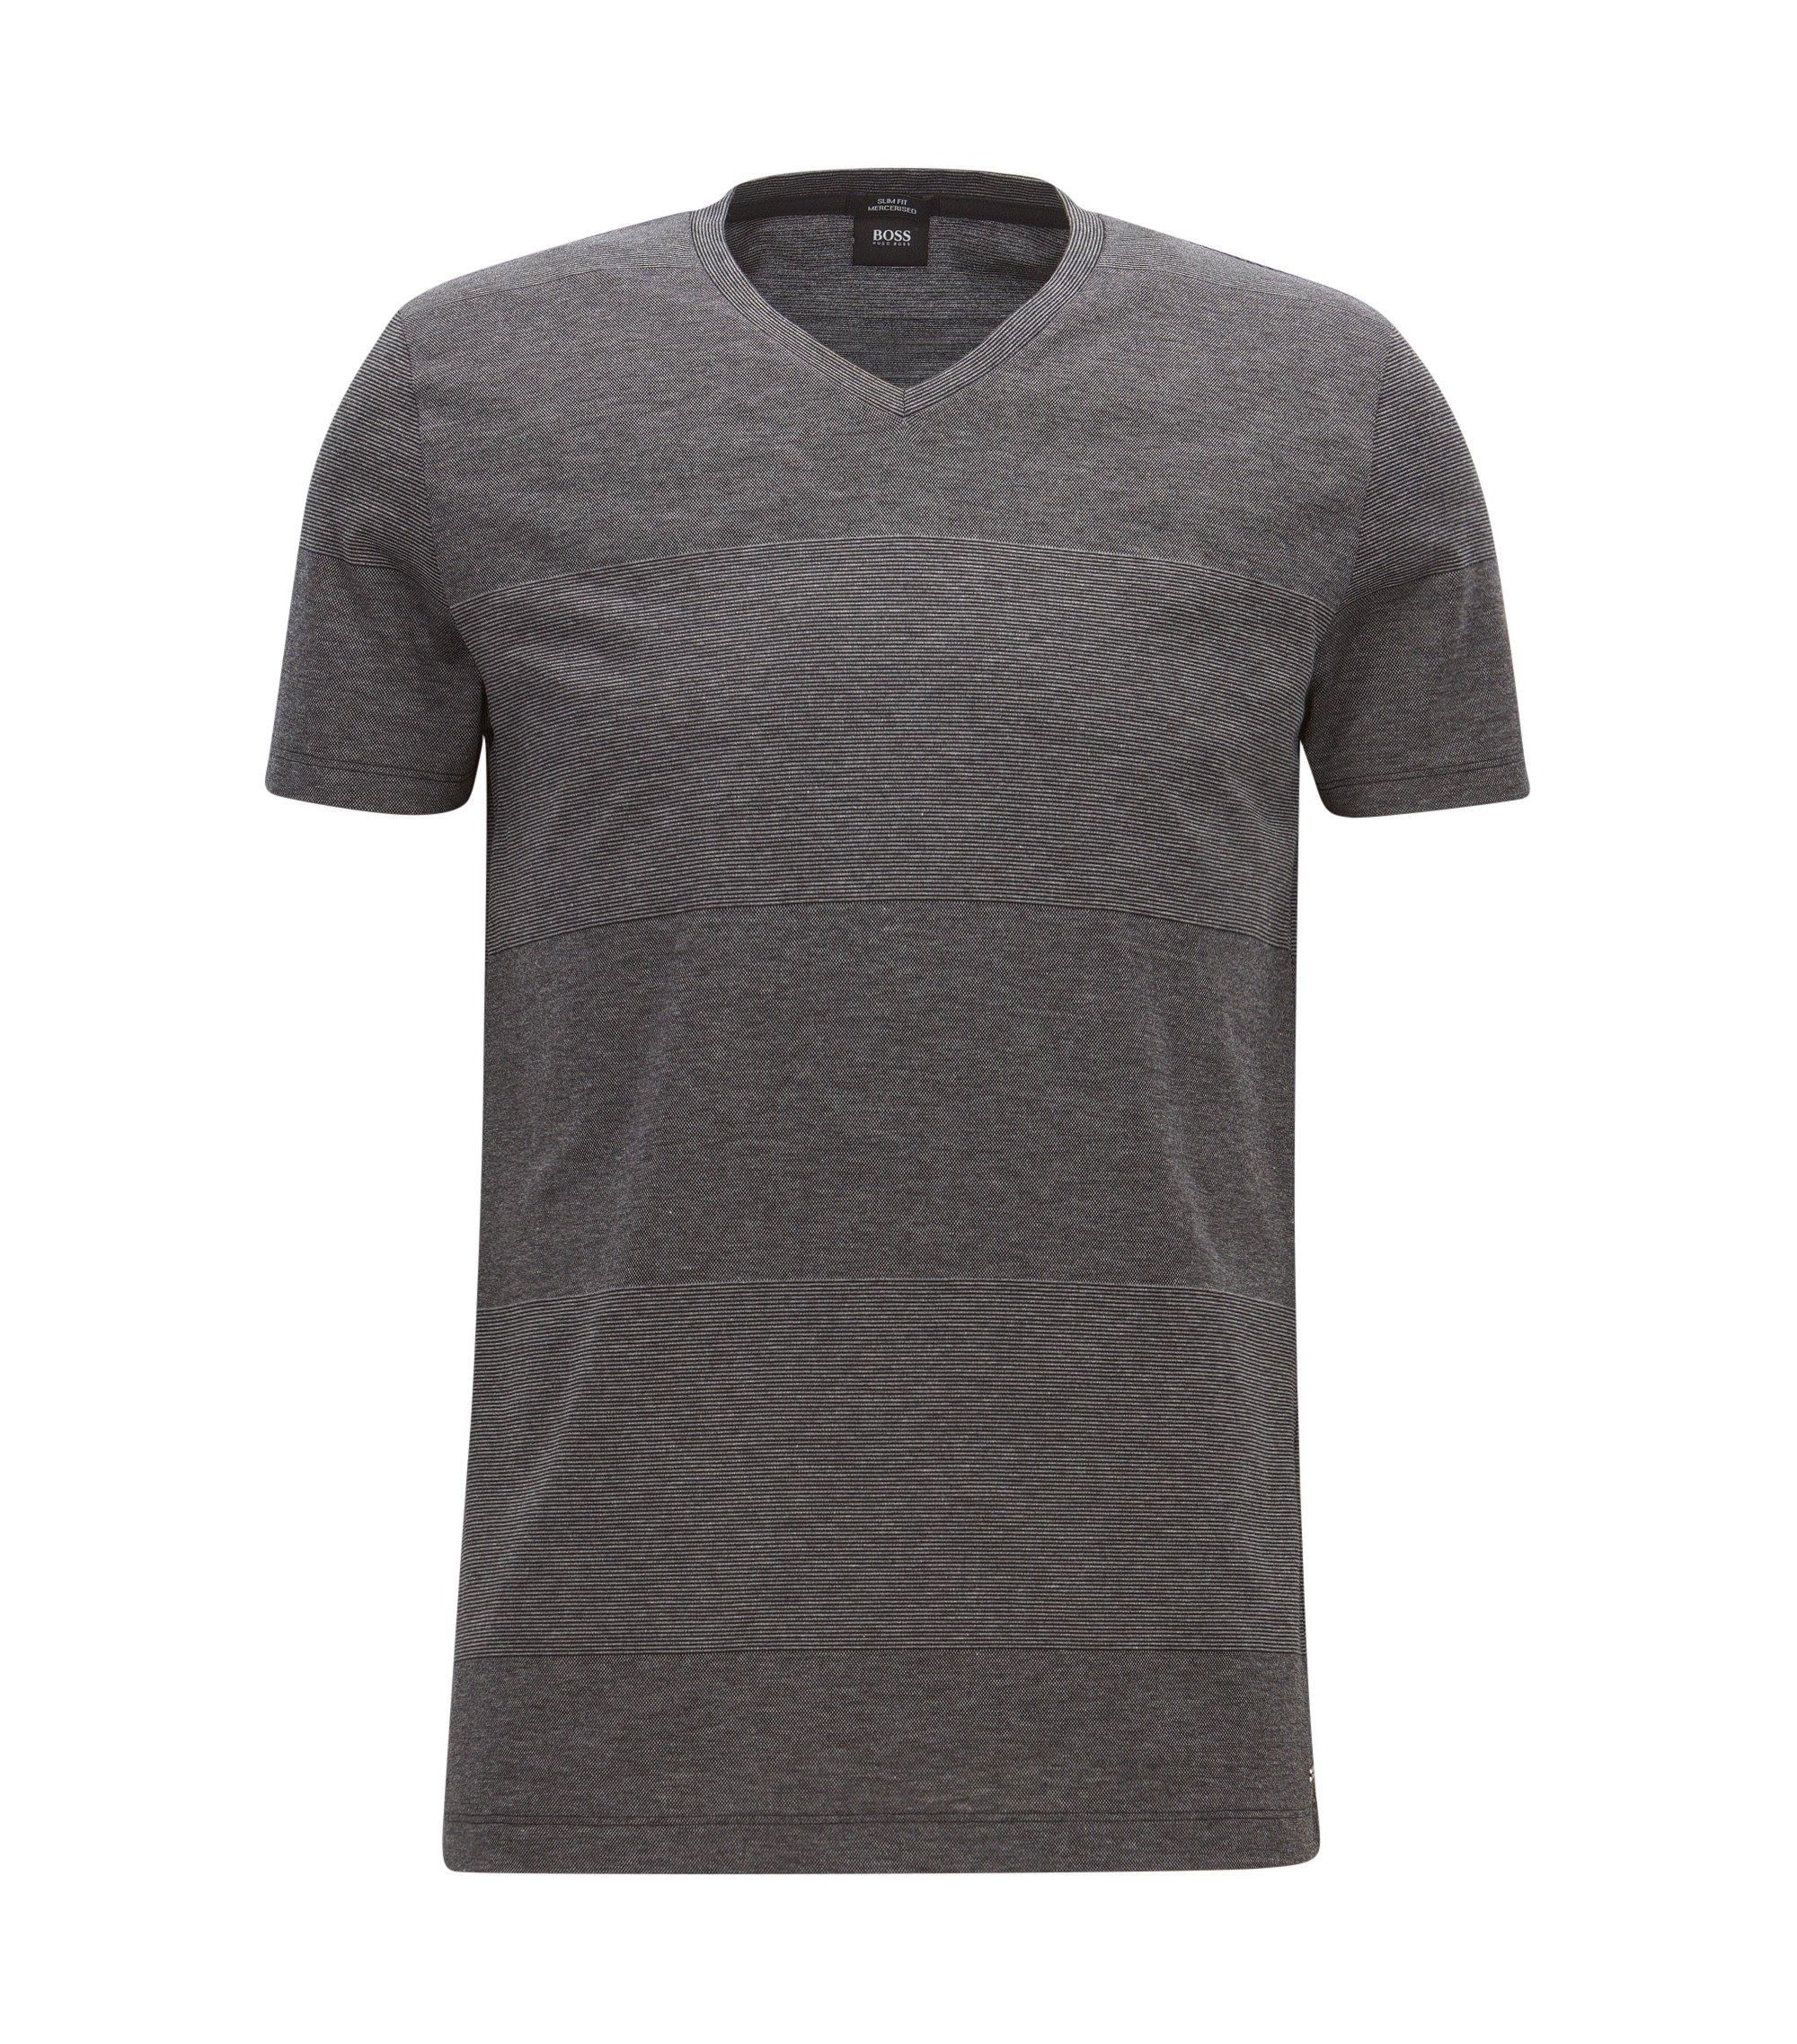 Striped Mercerized Cotton T-Shirt   Teal, Black